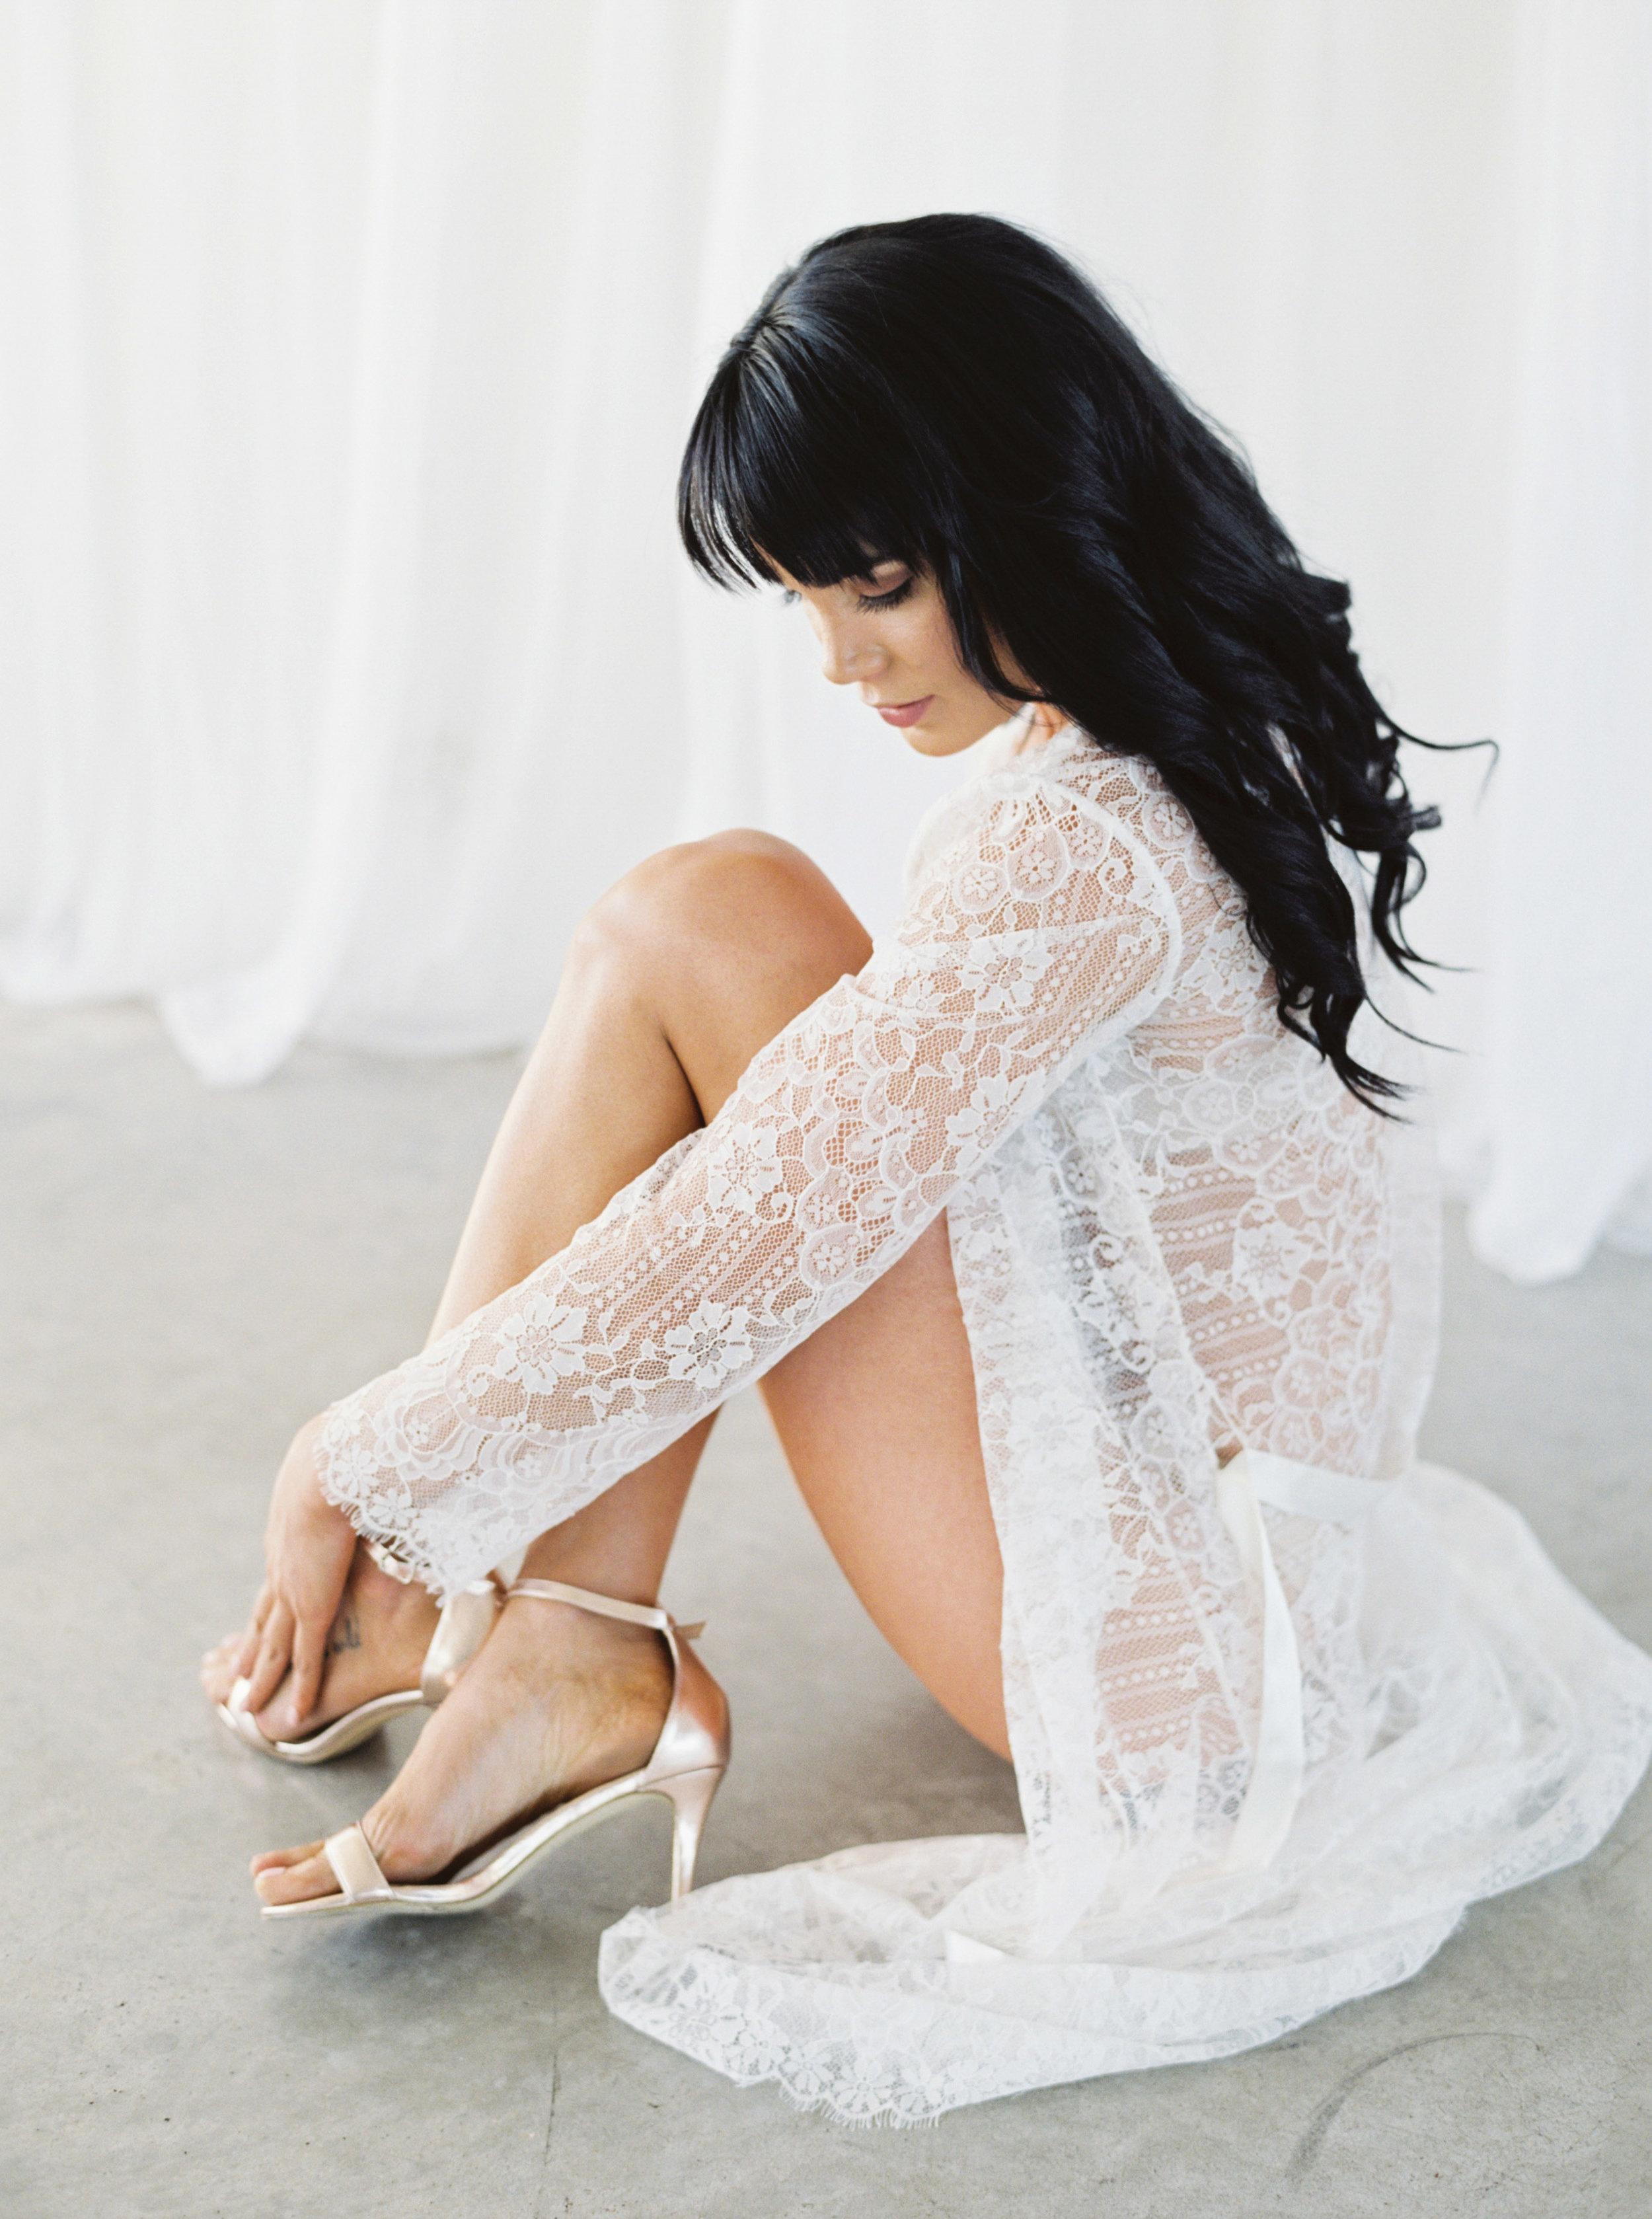 00010- Mudgee Wedding Photographer Sheri McMahon.jpg